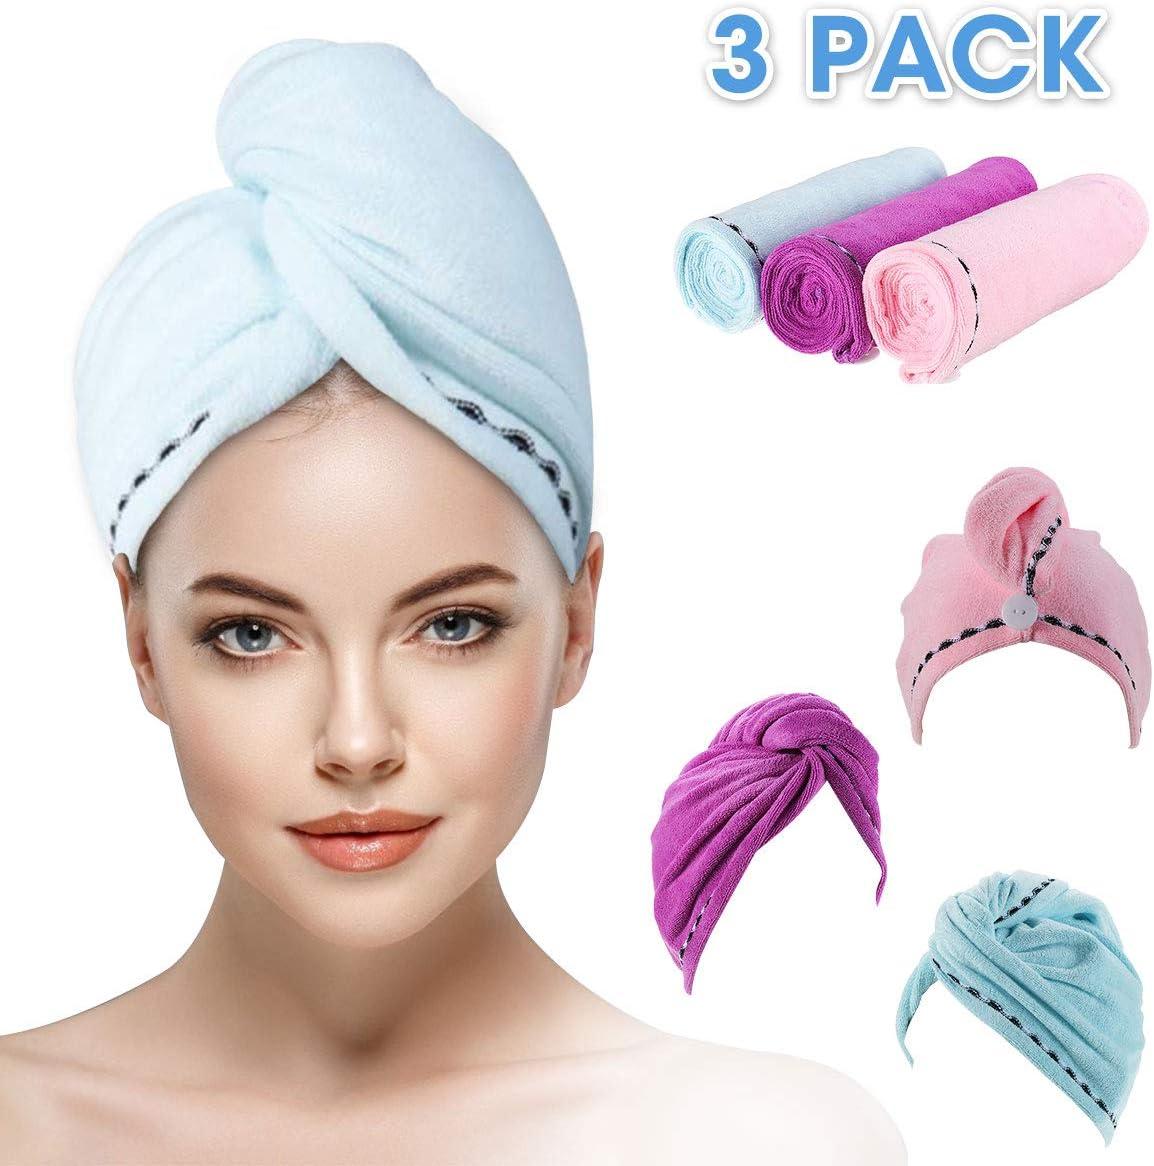 Microfiber Long Hair Drying Wrap Towel Super Absorbent Fiber Fast Dry Towel